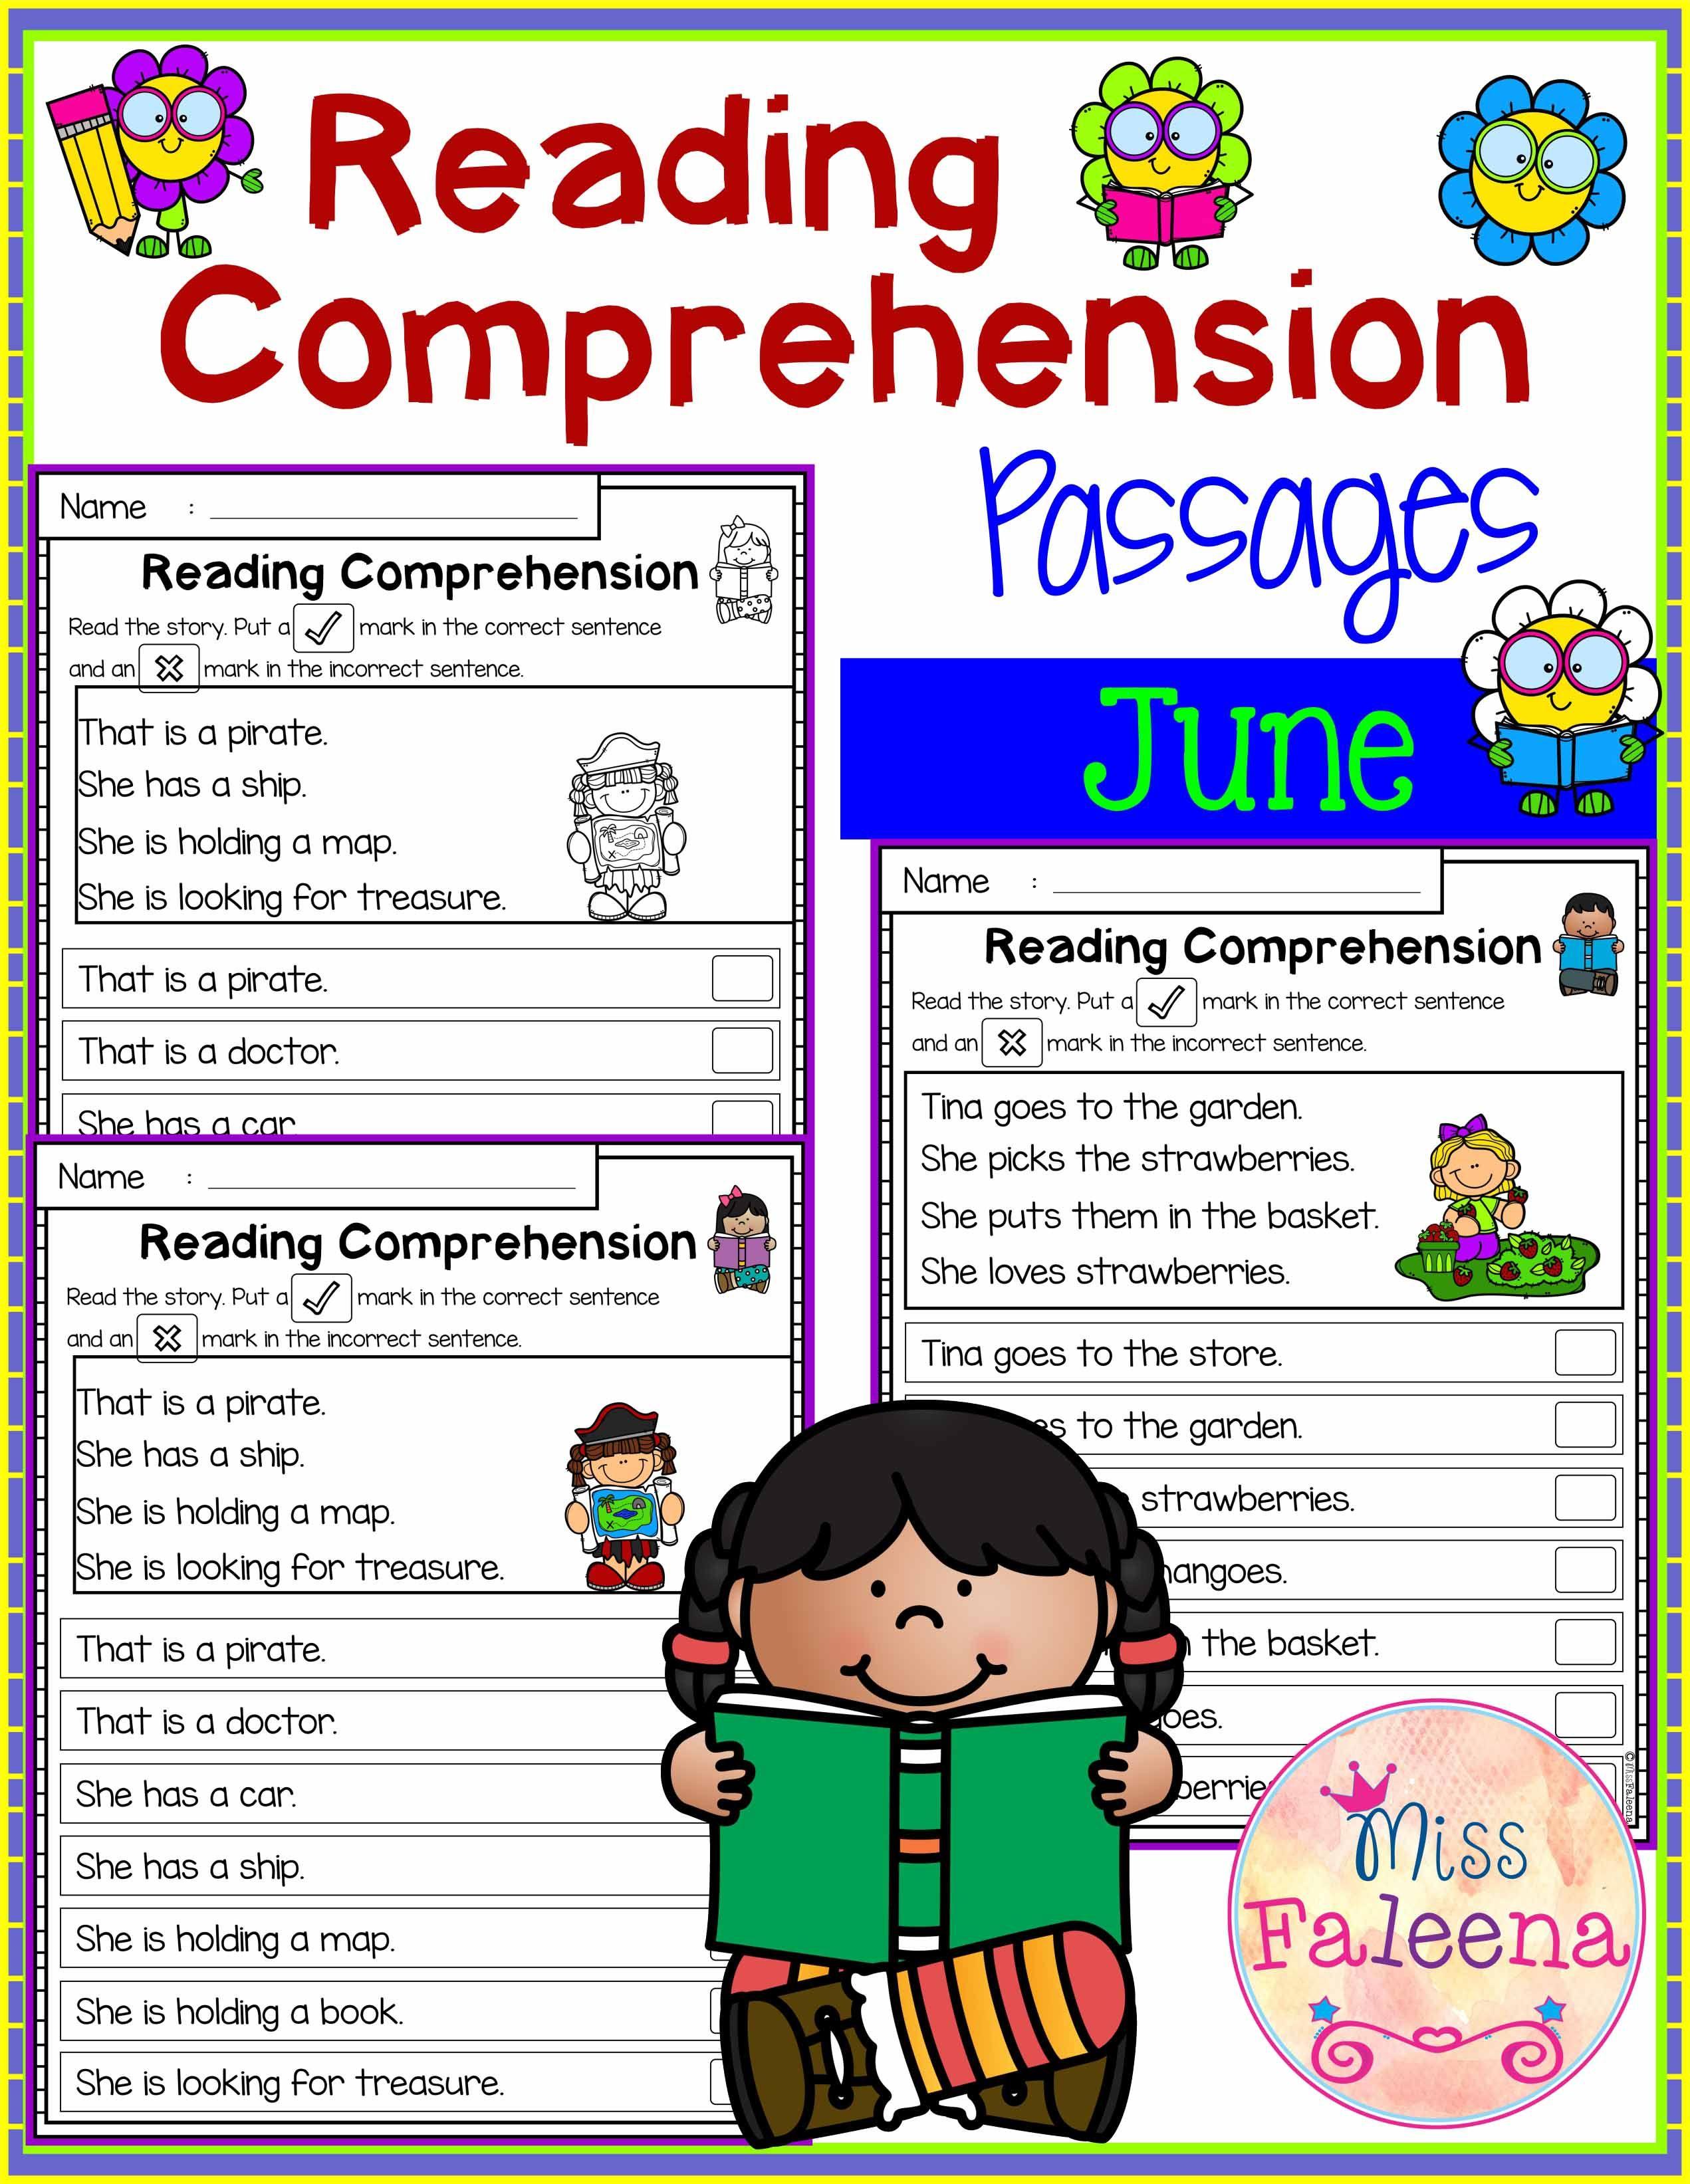 June Reading Comprehension Passages